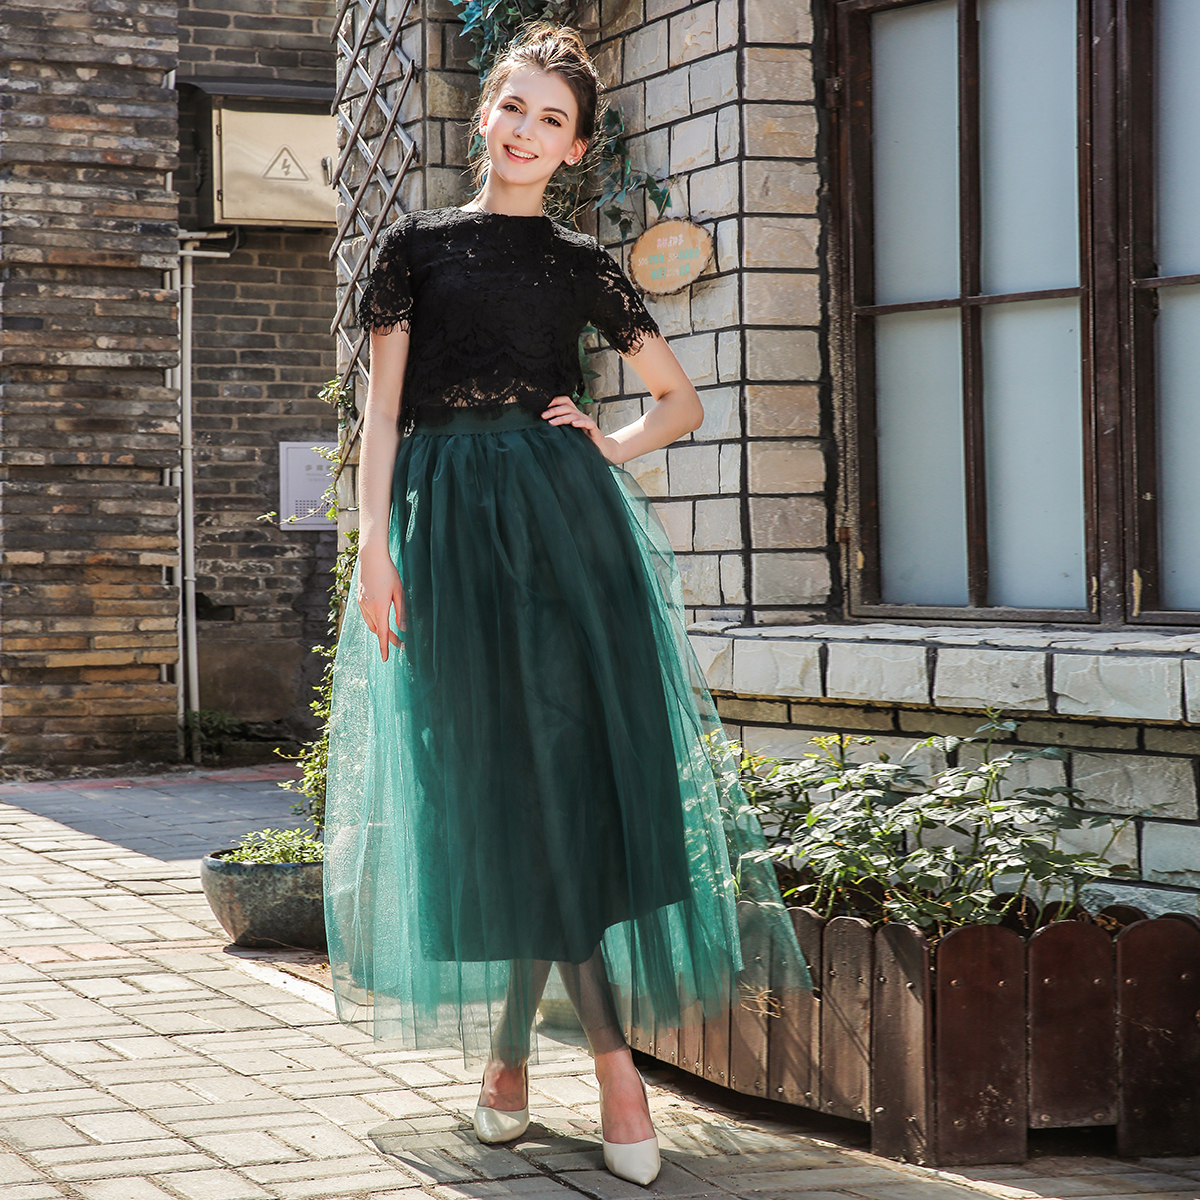 4 straturi 100cm 2018 Maxi Tutu Tutu Fuste Femei Fusta plisata Lolita Petticoat faldas mujer saias Jupe